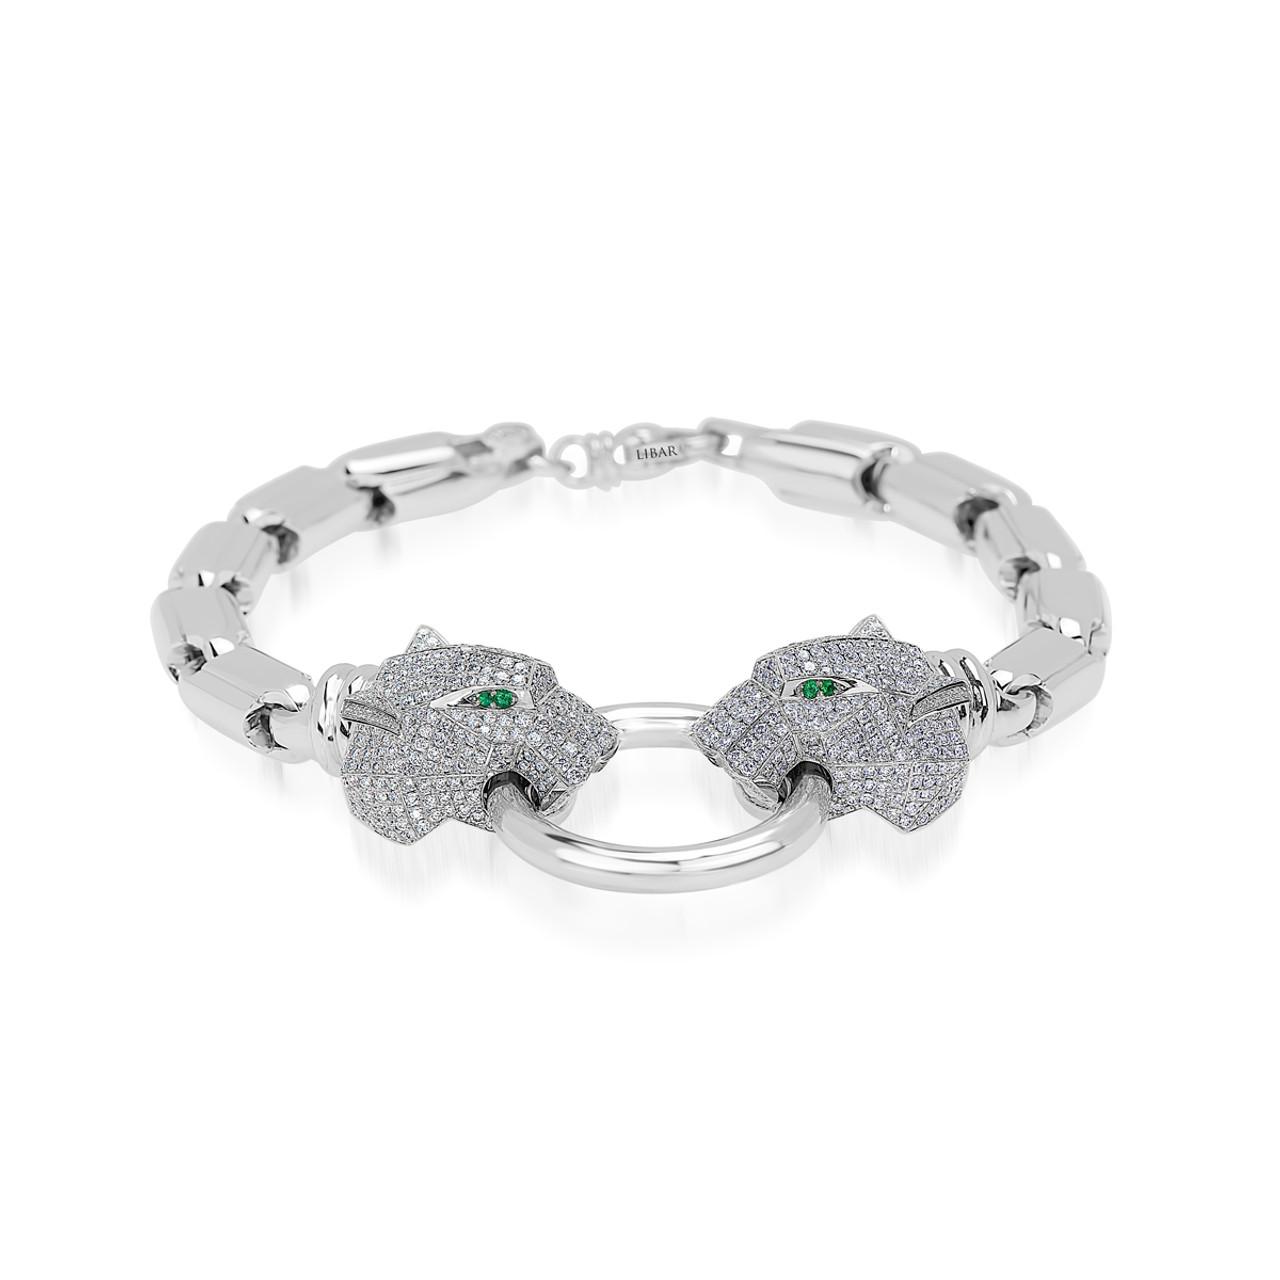 ae809e82d4b5e Pave Set Diamond and Emerald Panther Head Bracelet